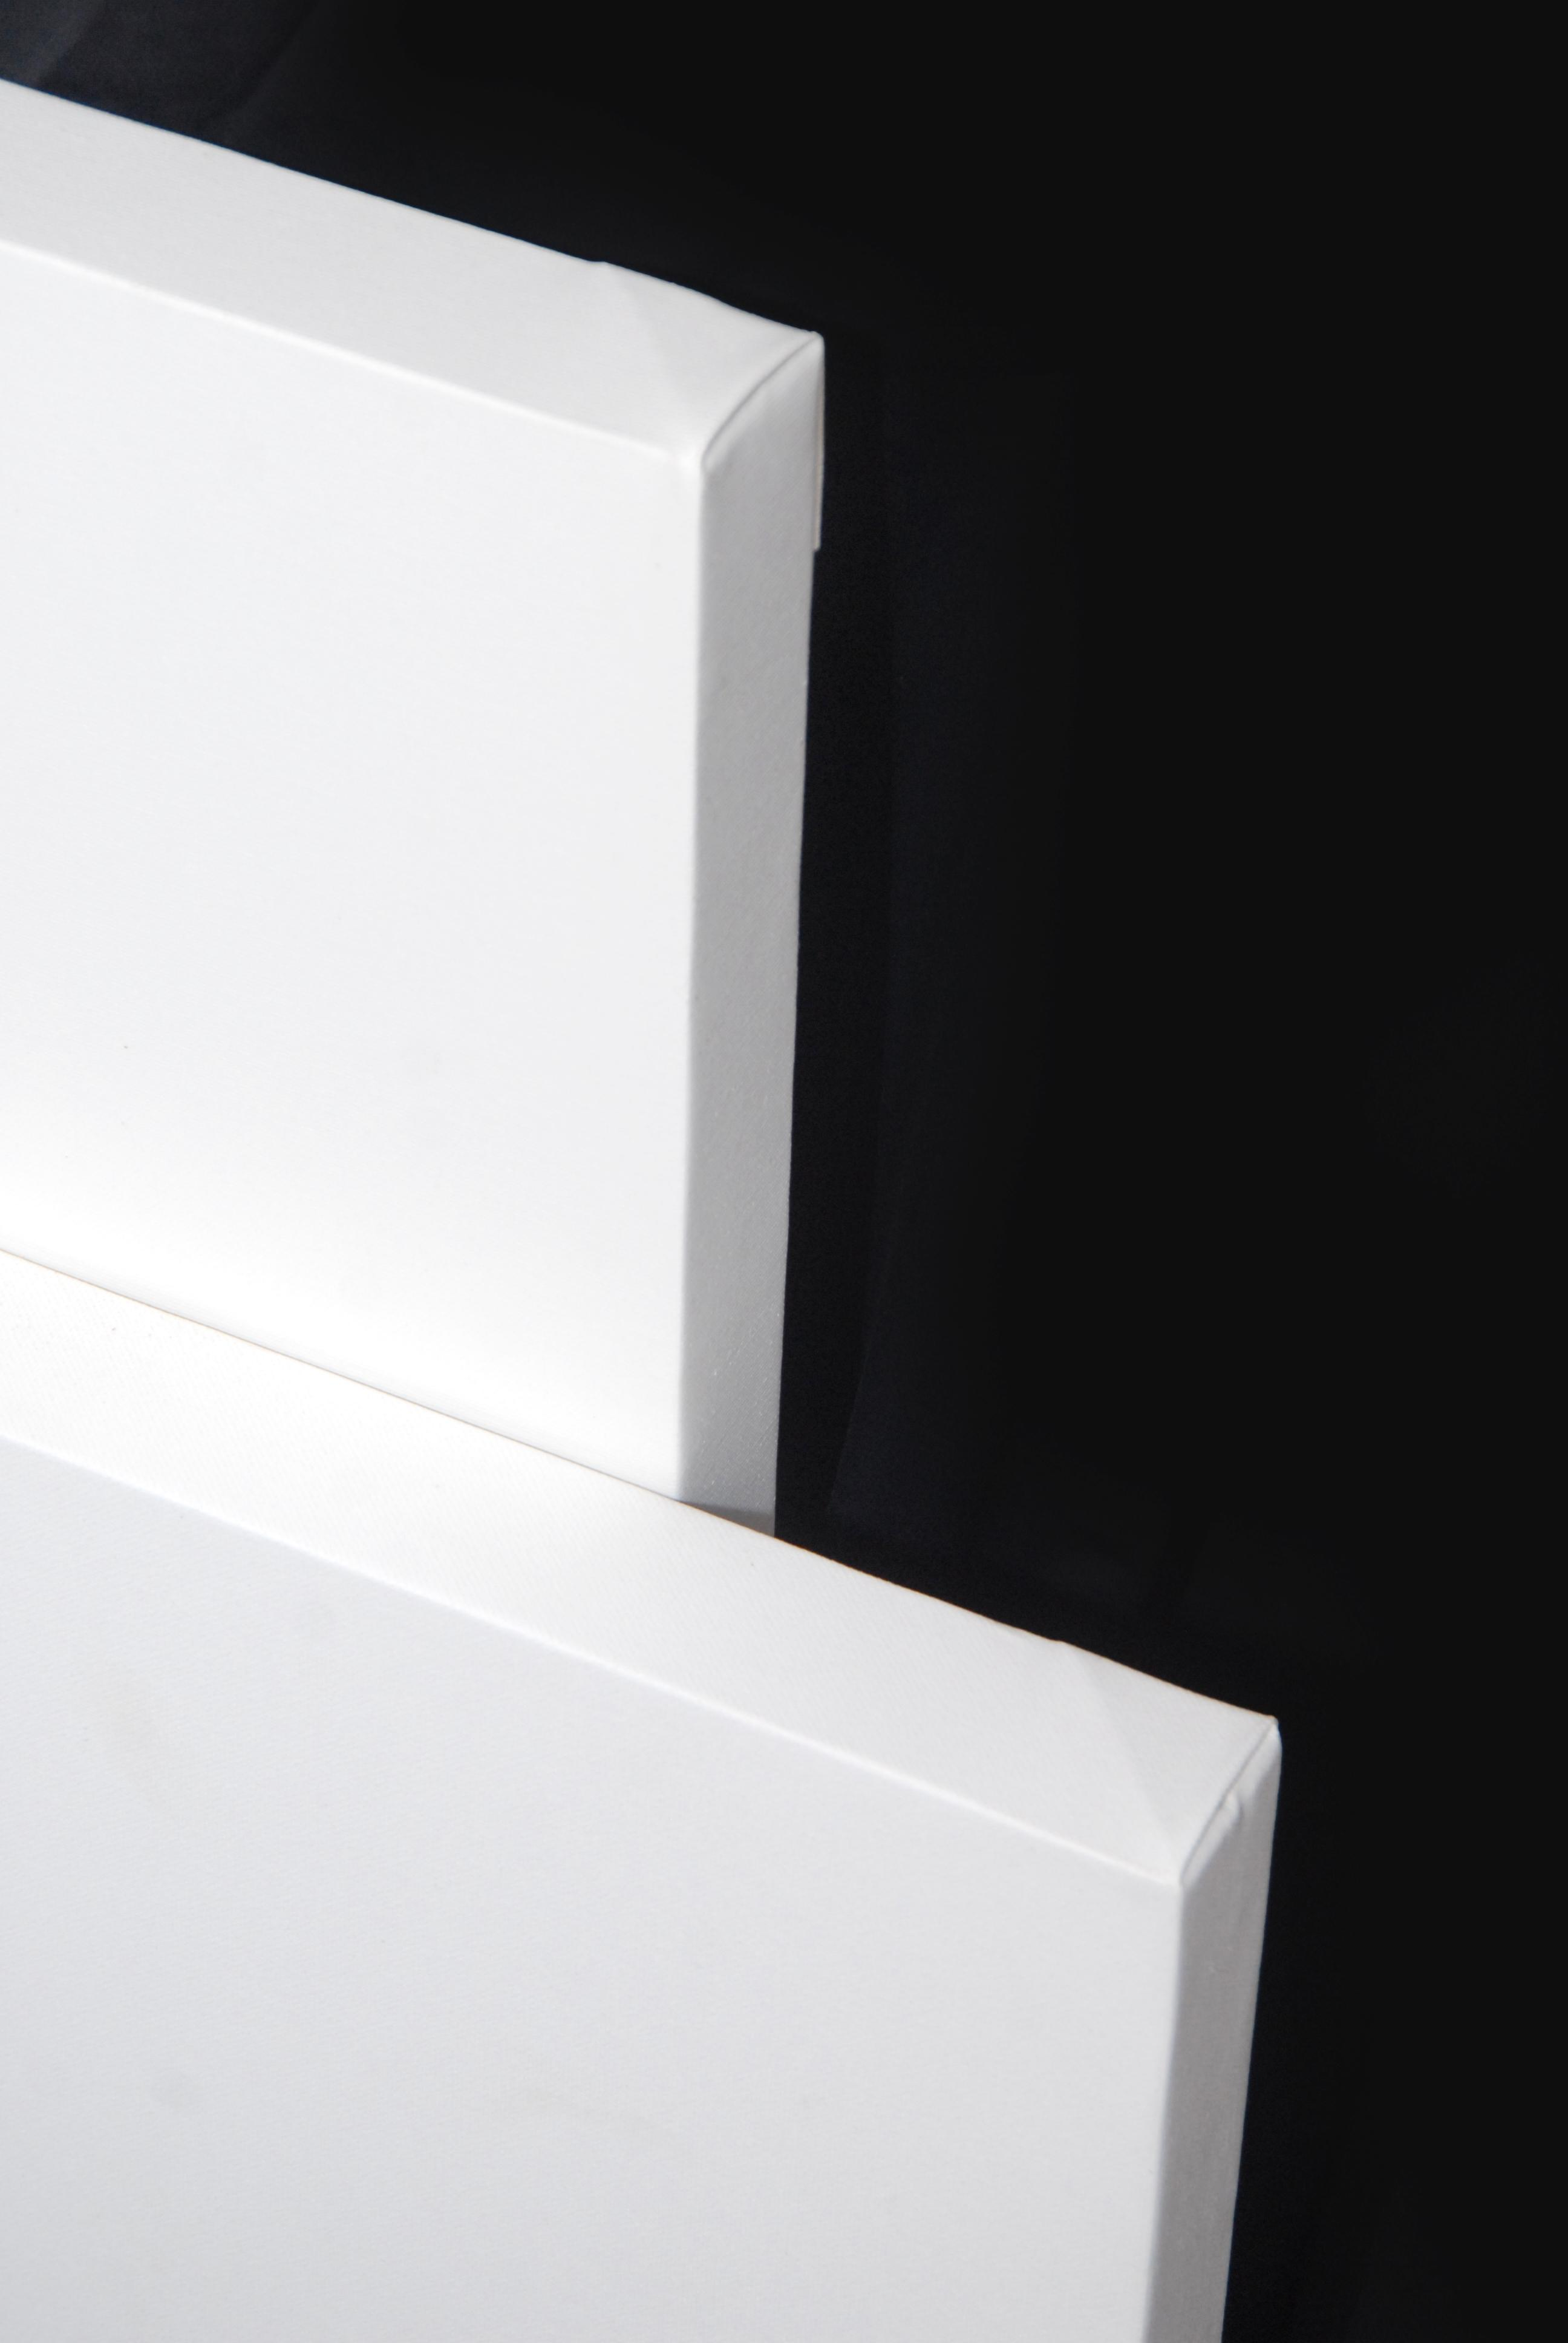 Tele Gallery in Juta - profilo telaio 4 cm -Tele Gallery Juta Bianche per dipingere